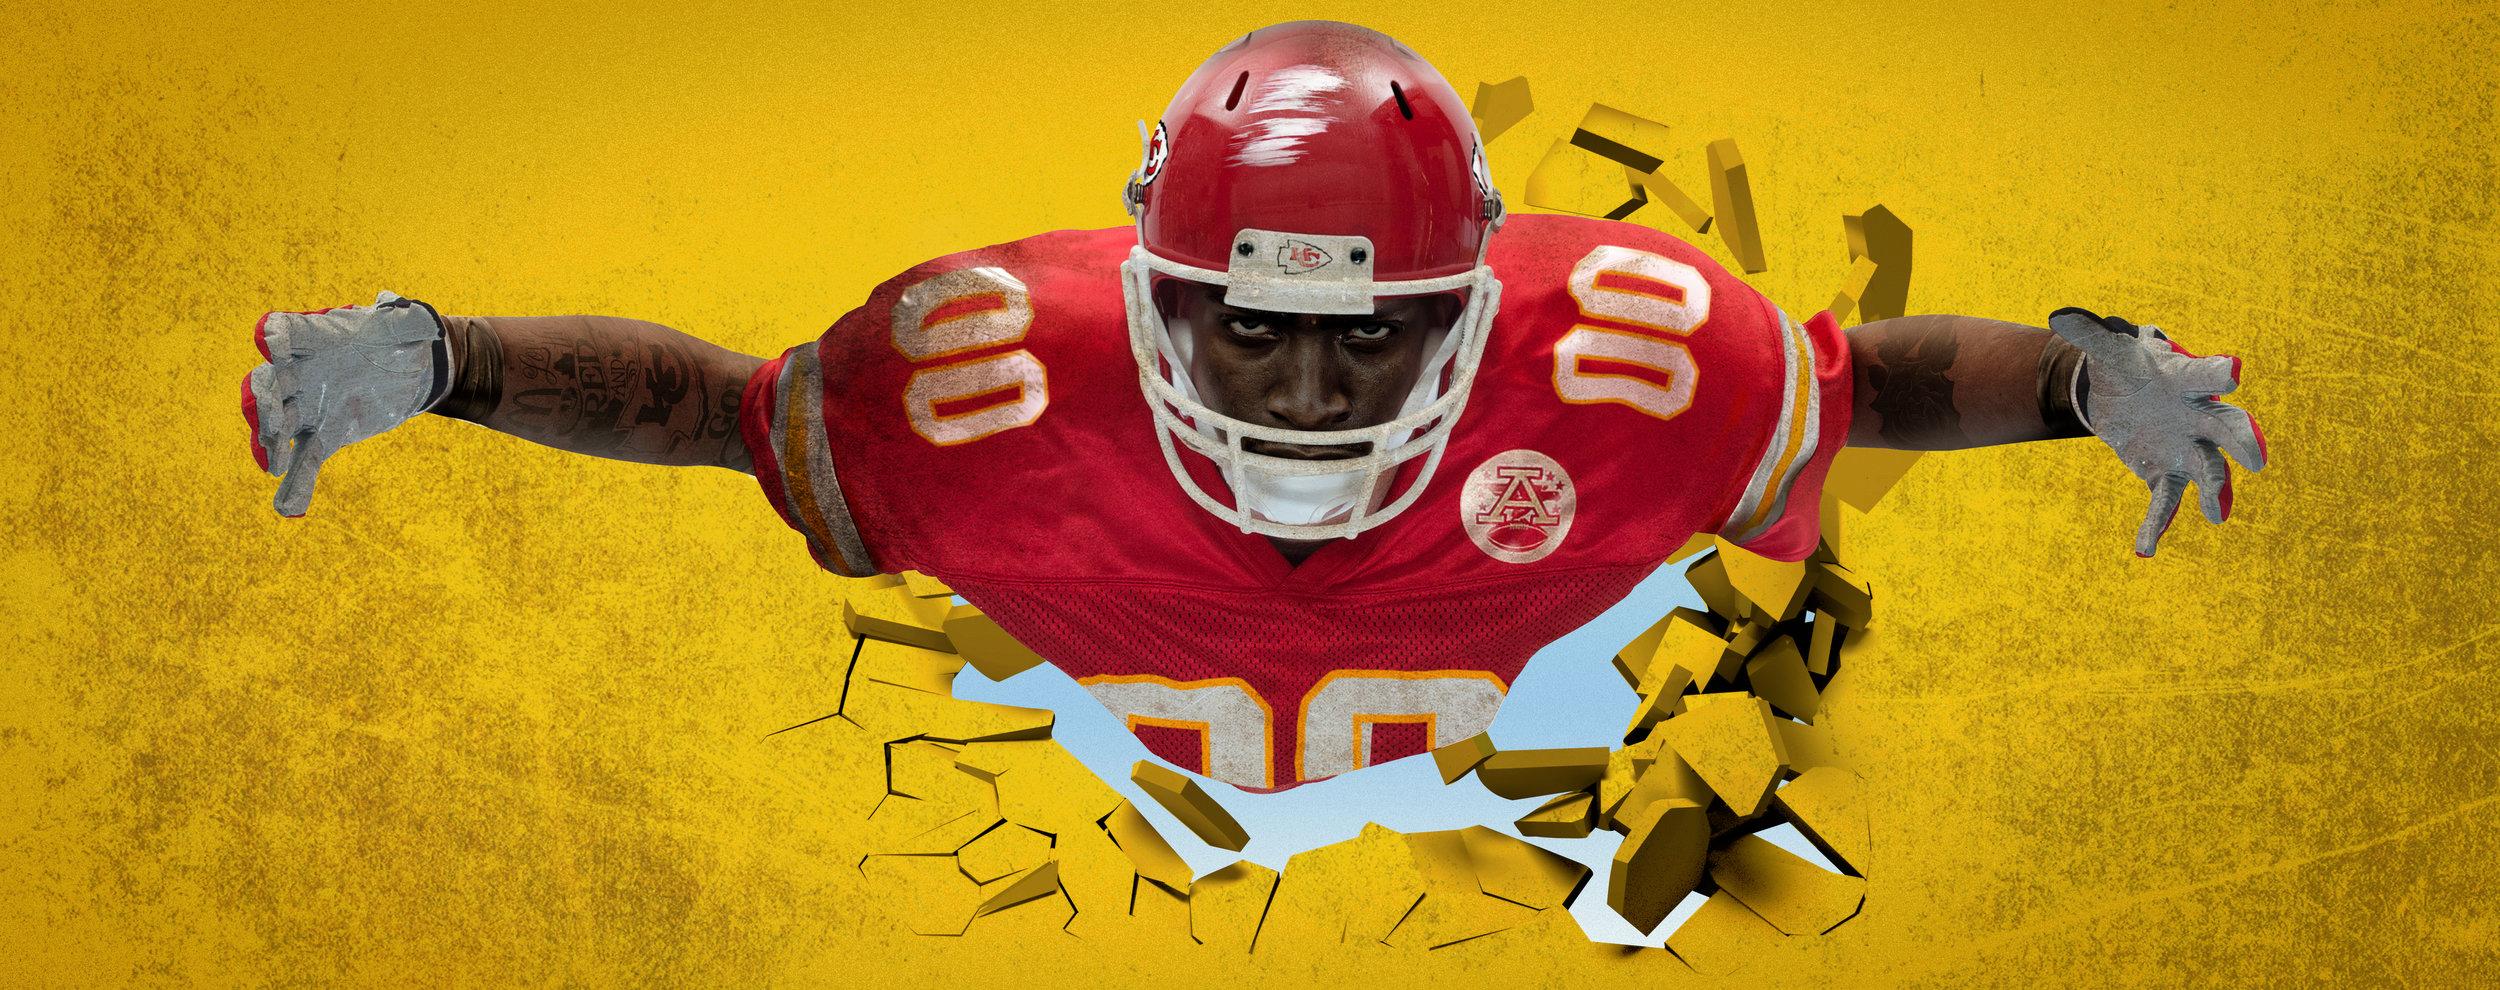 Chiefs_Player_OOH_after.jpg